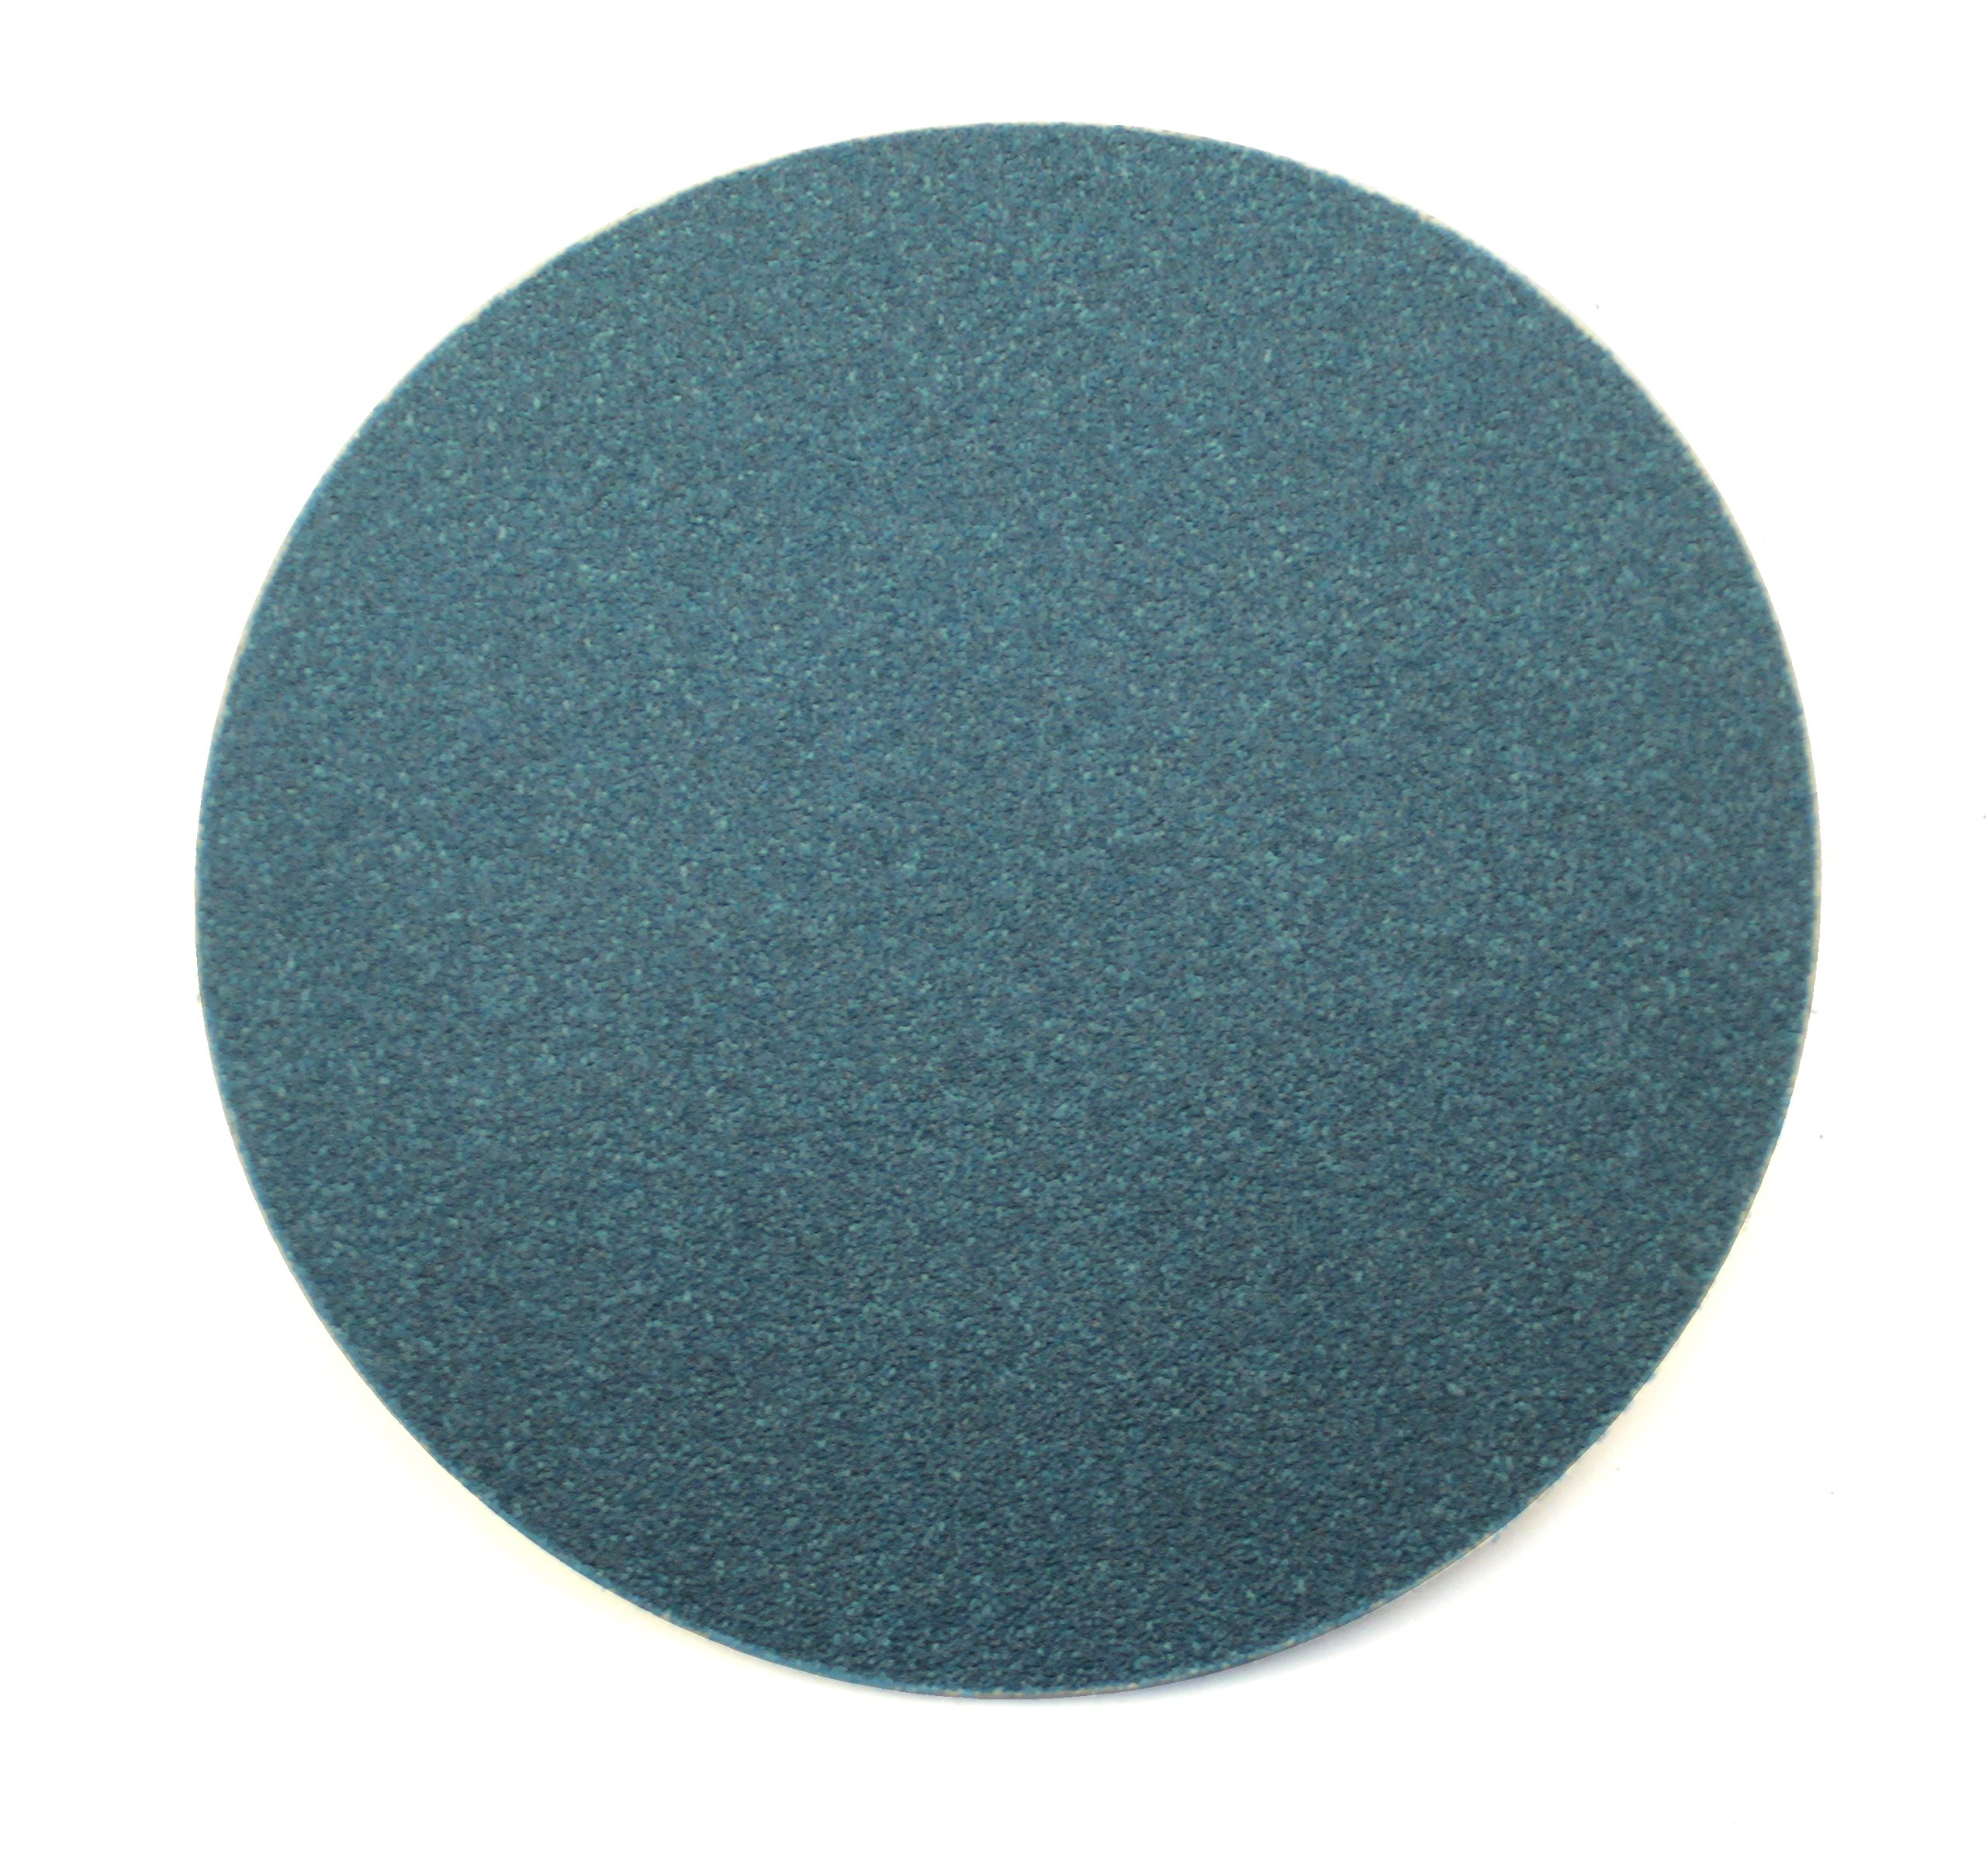 Karebac 8hsz40 40 Grit Heavyweight Blue Zirconia PSA Sticky Discs (25 Pack), 8